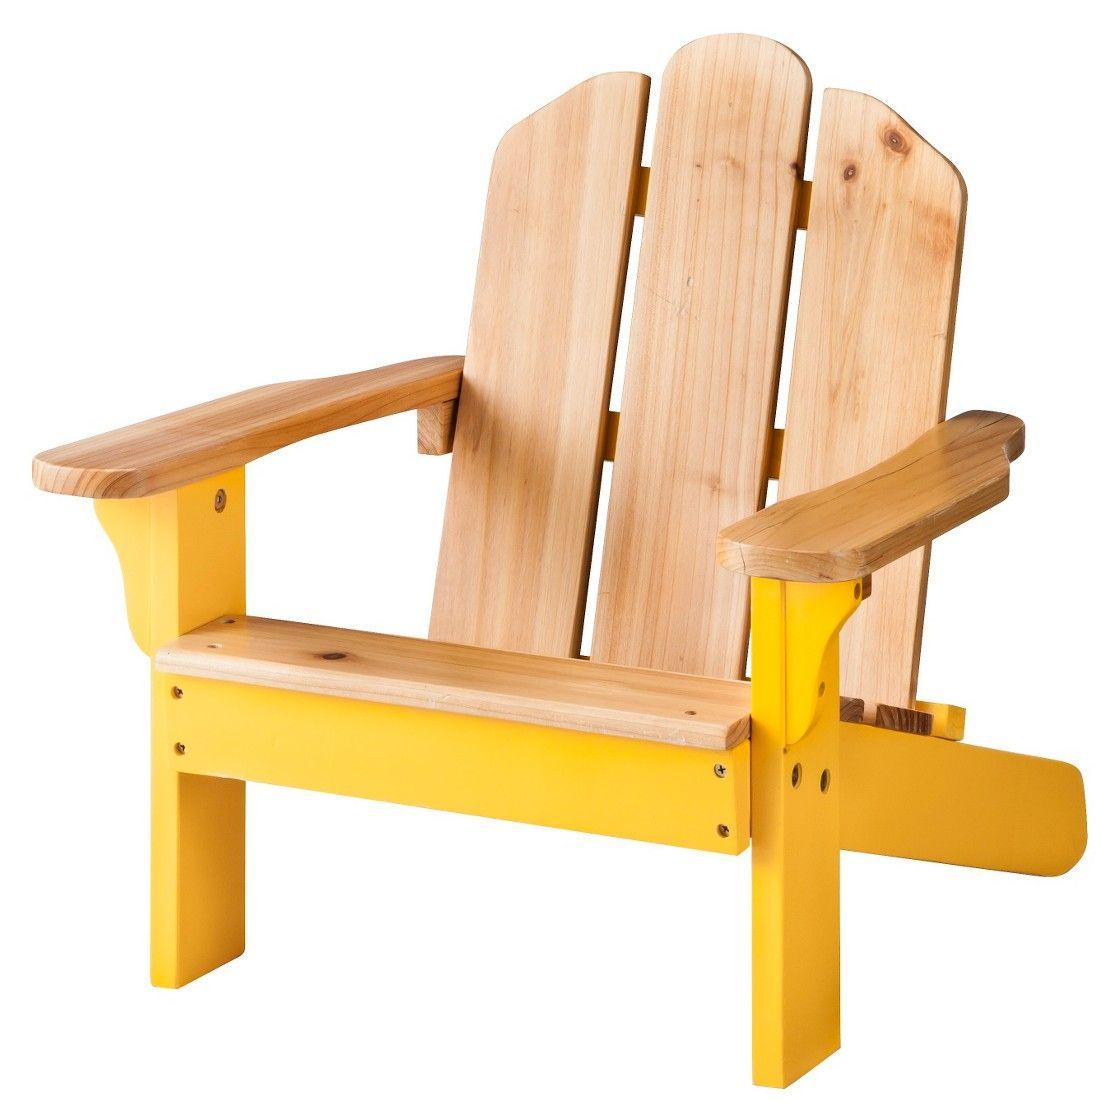 Room essentials kids wood patio adirondack chair yellow